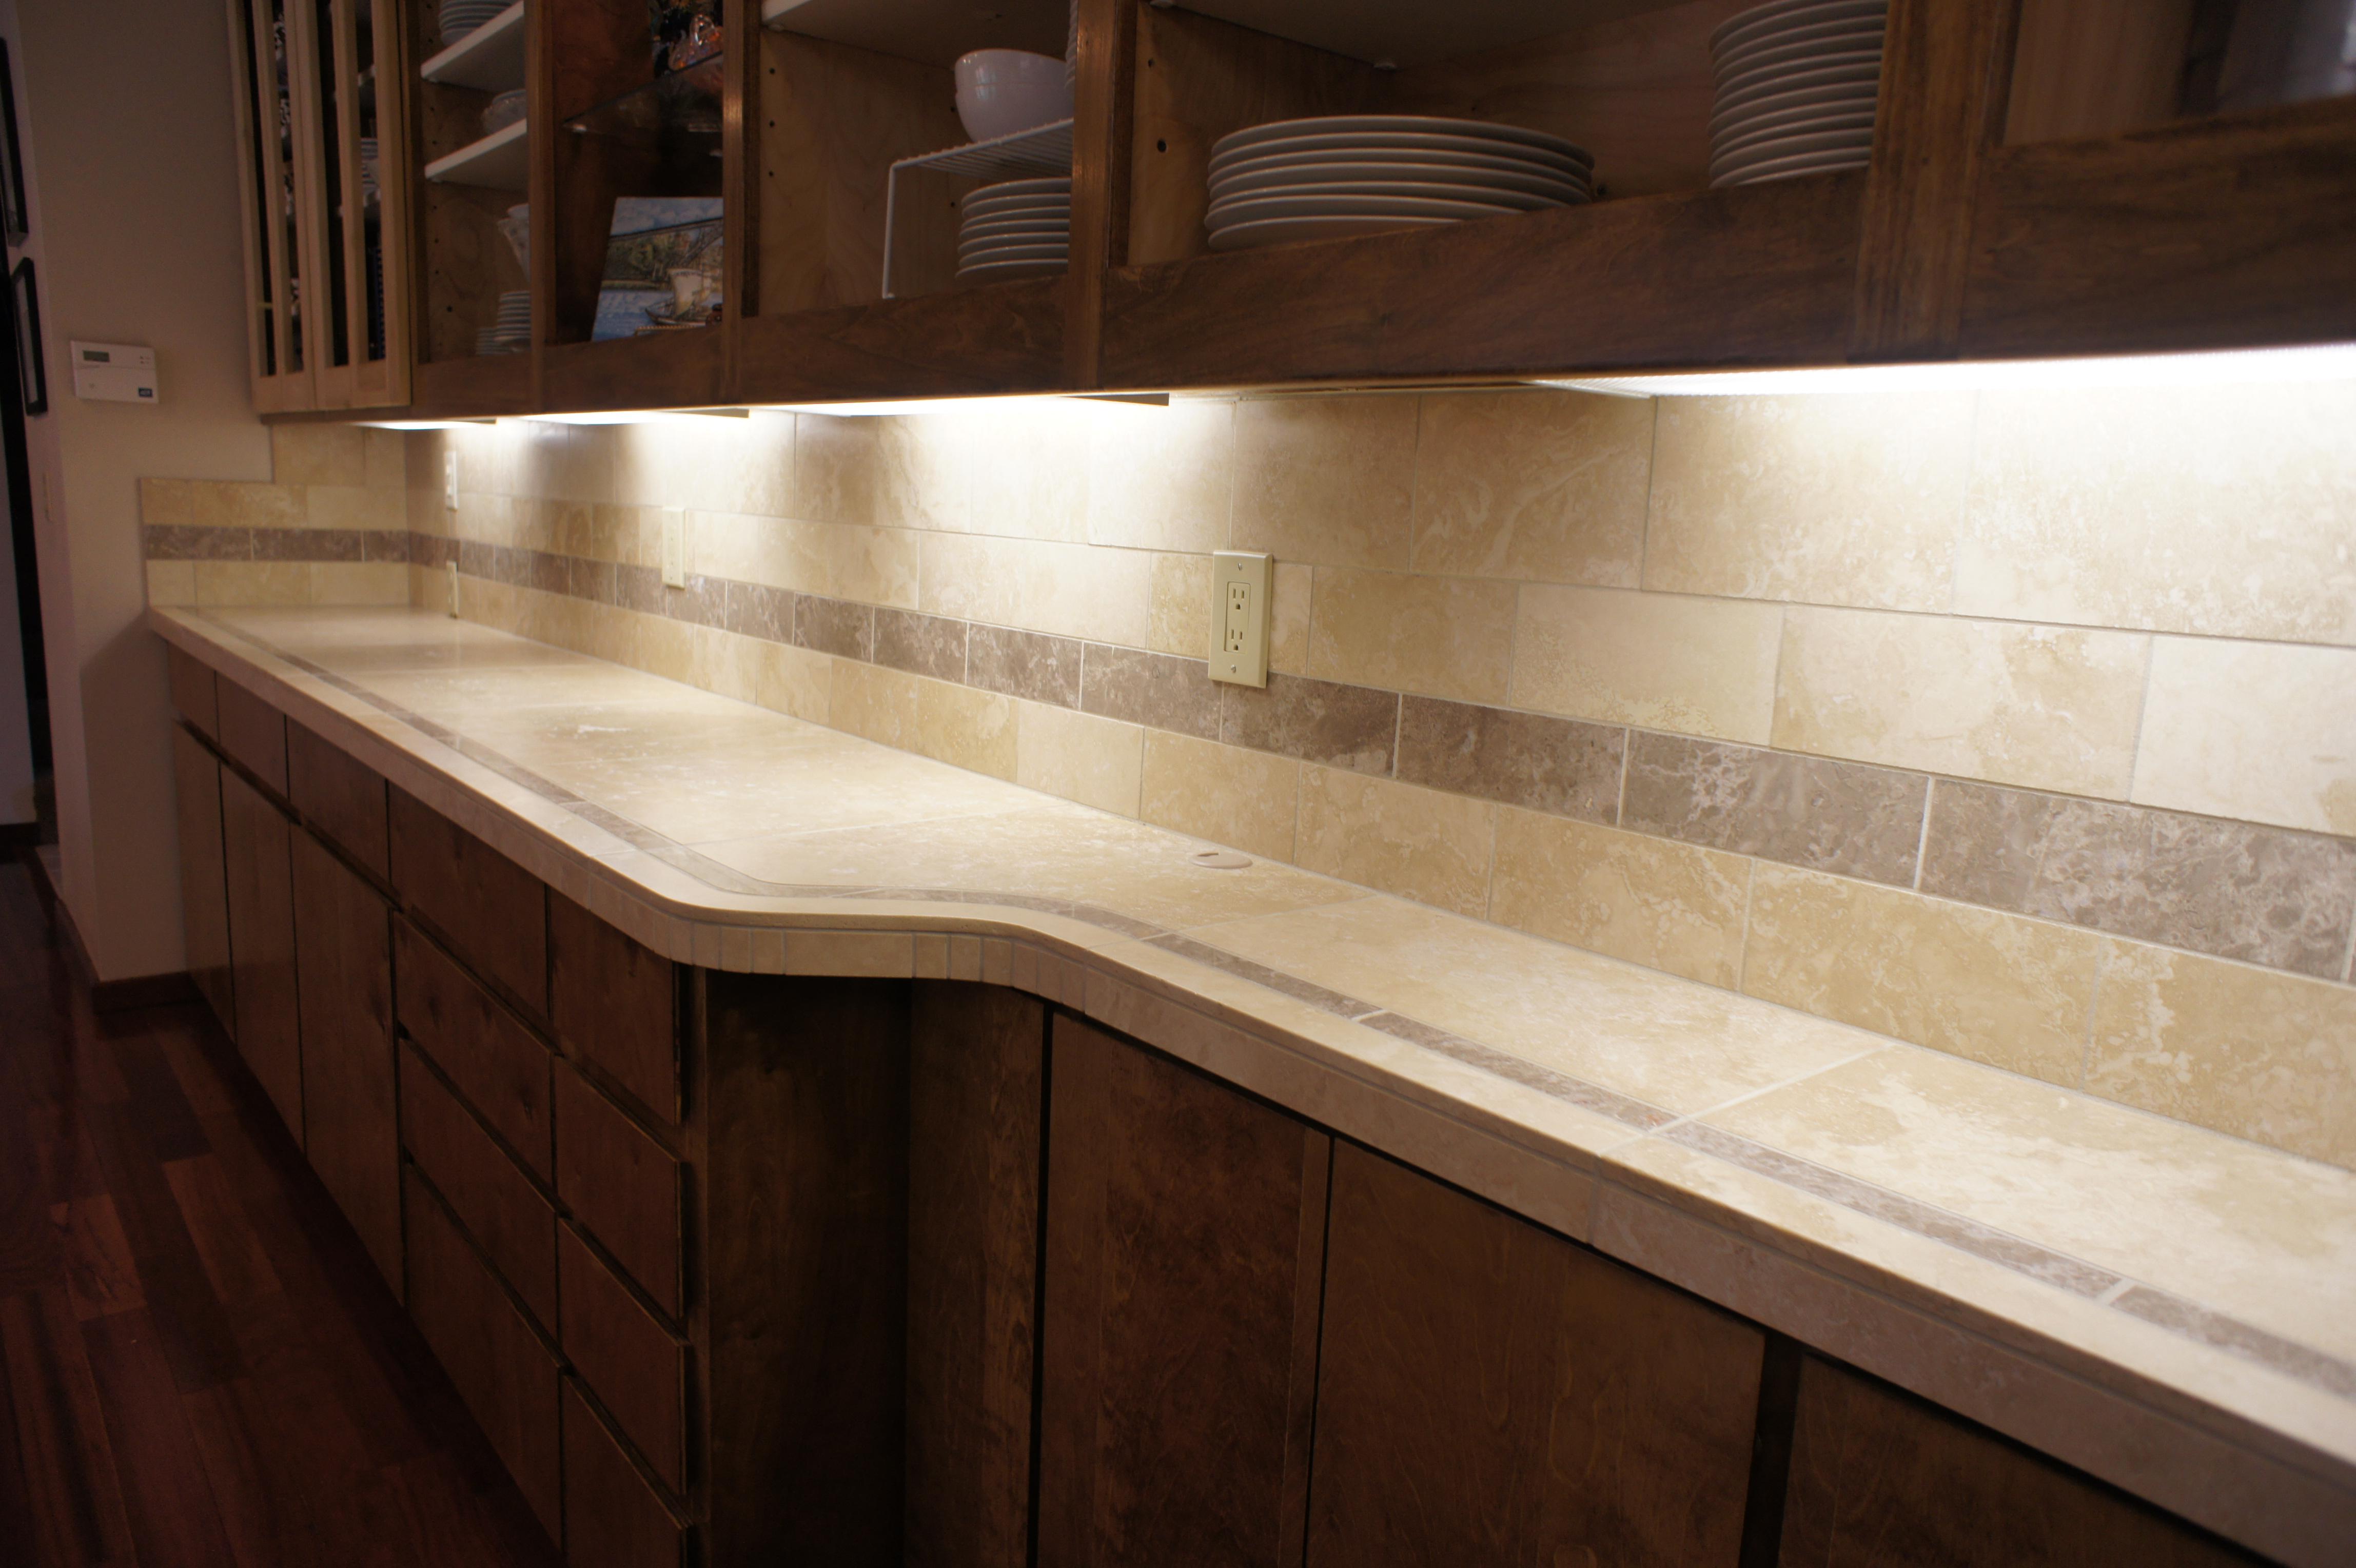 Travertine and Marble countertop Rhone Design